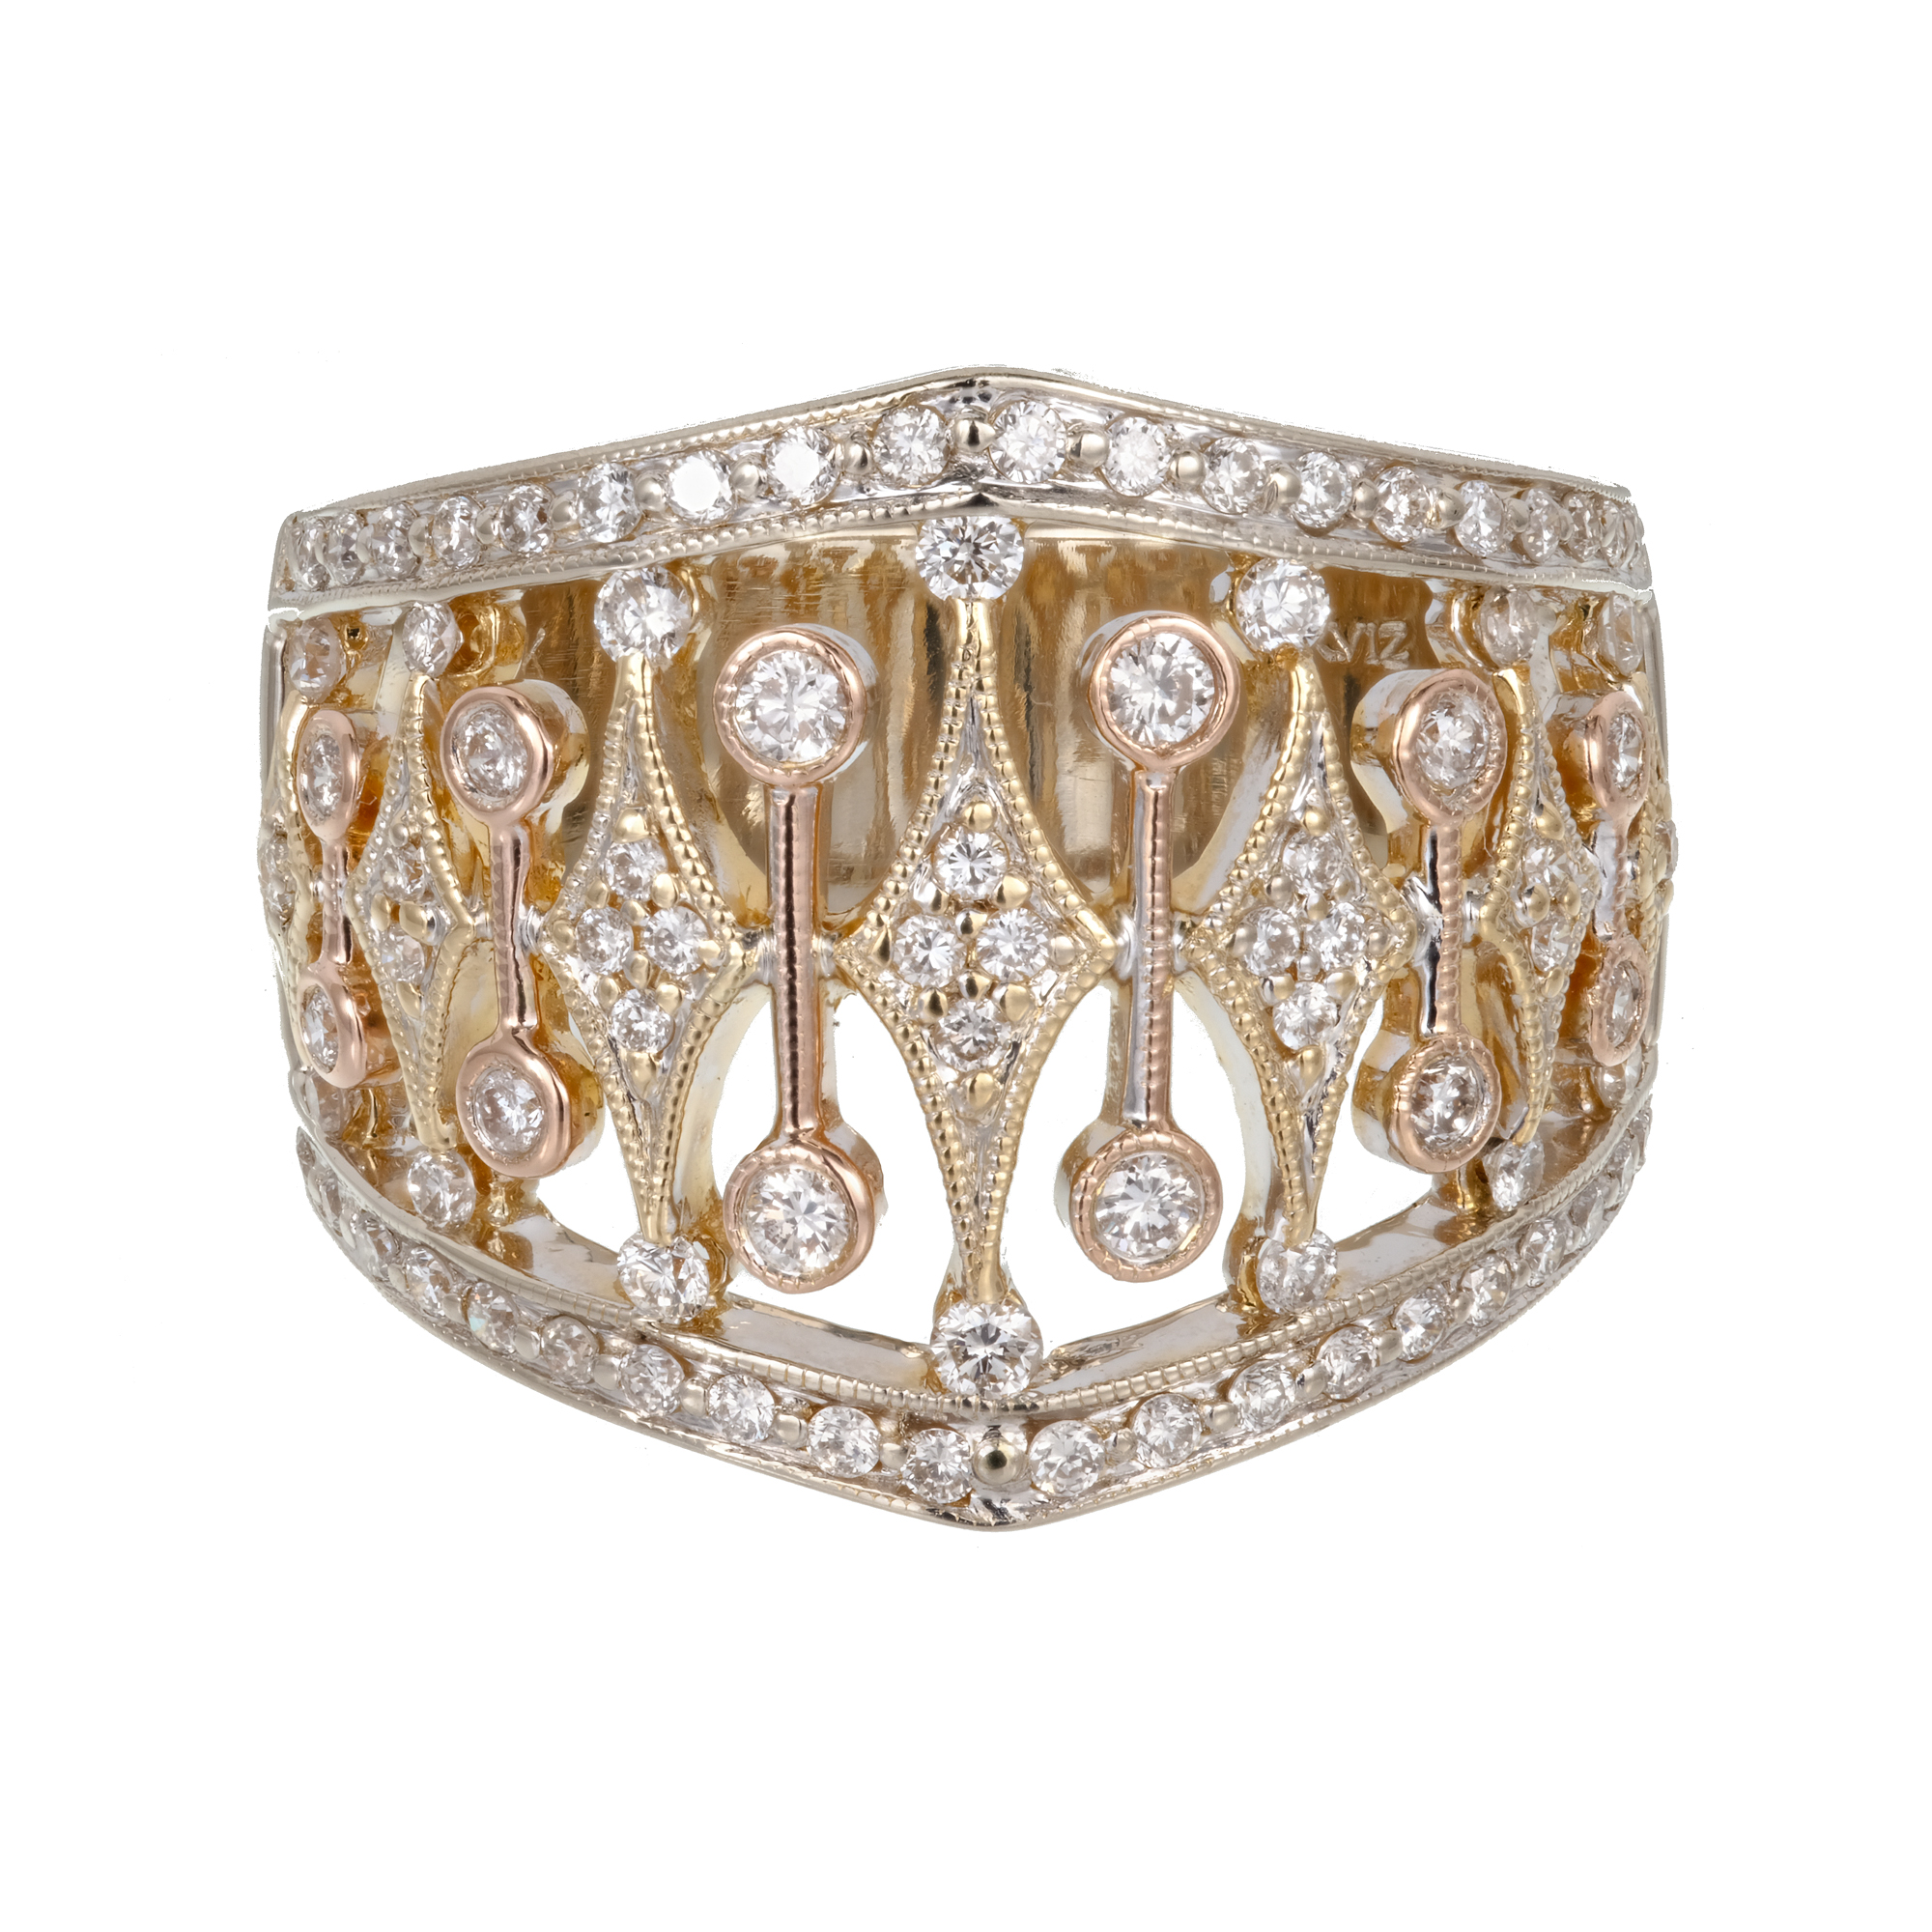 "Image of ""Parviz 18K White, Yellow and Pink Gold 0.70ct Diamond Band Ring Size 7"""